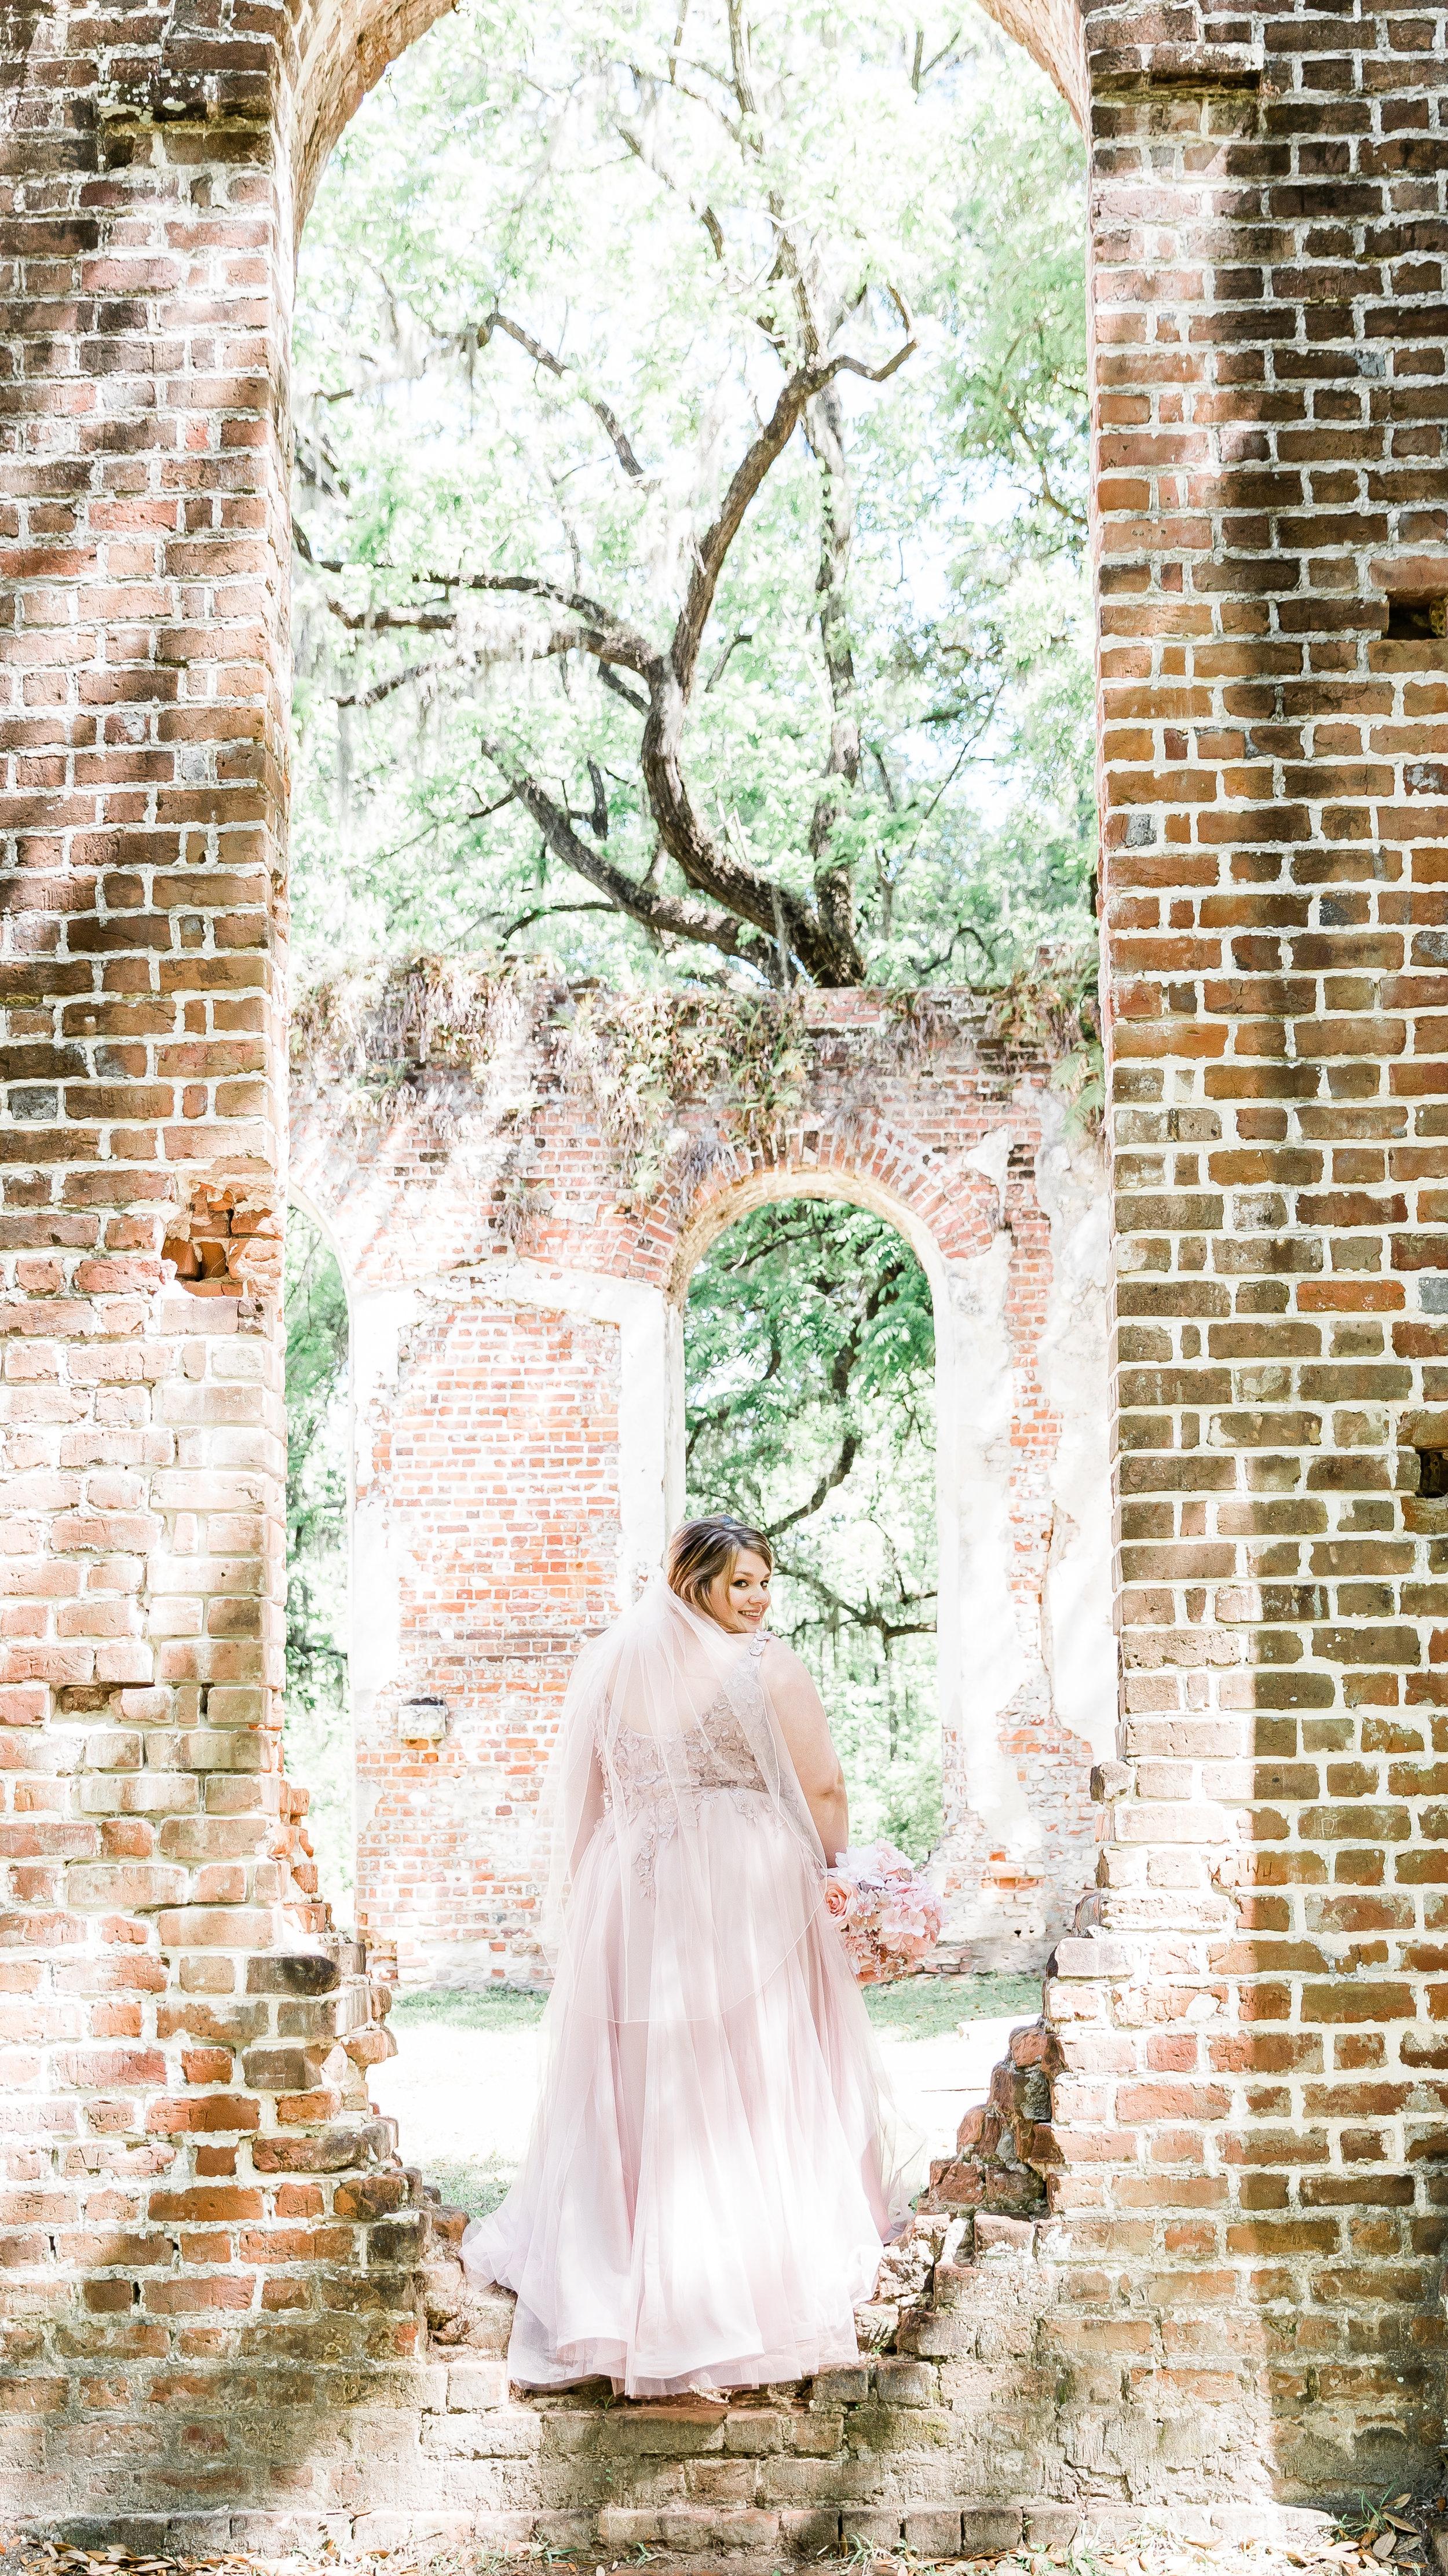 20190417-Southern Lens Photography-savannah family photographer- Ashley and Zack-old sheldon church ruins-201928.jpg